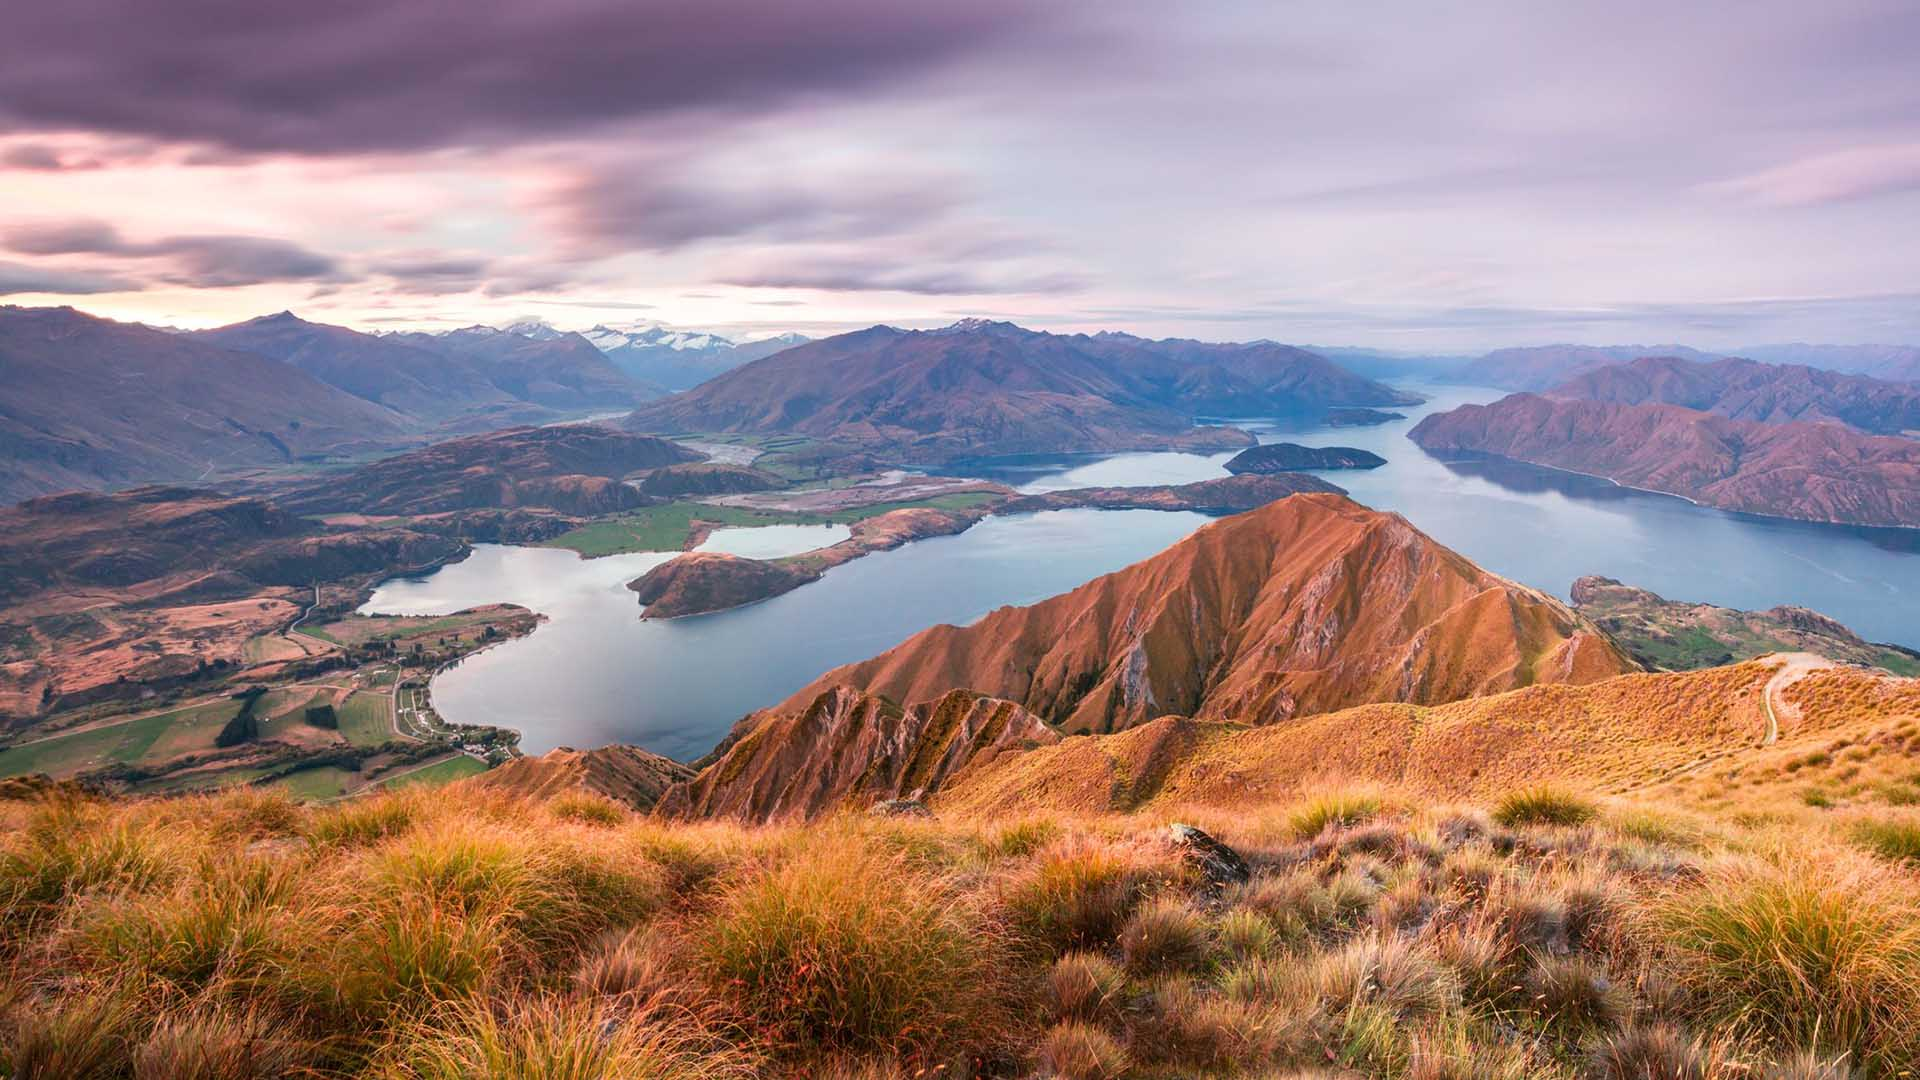 Nuova Zelanda Beauty